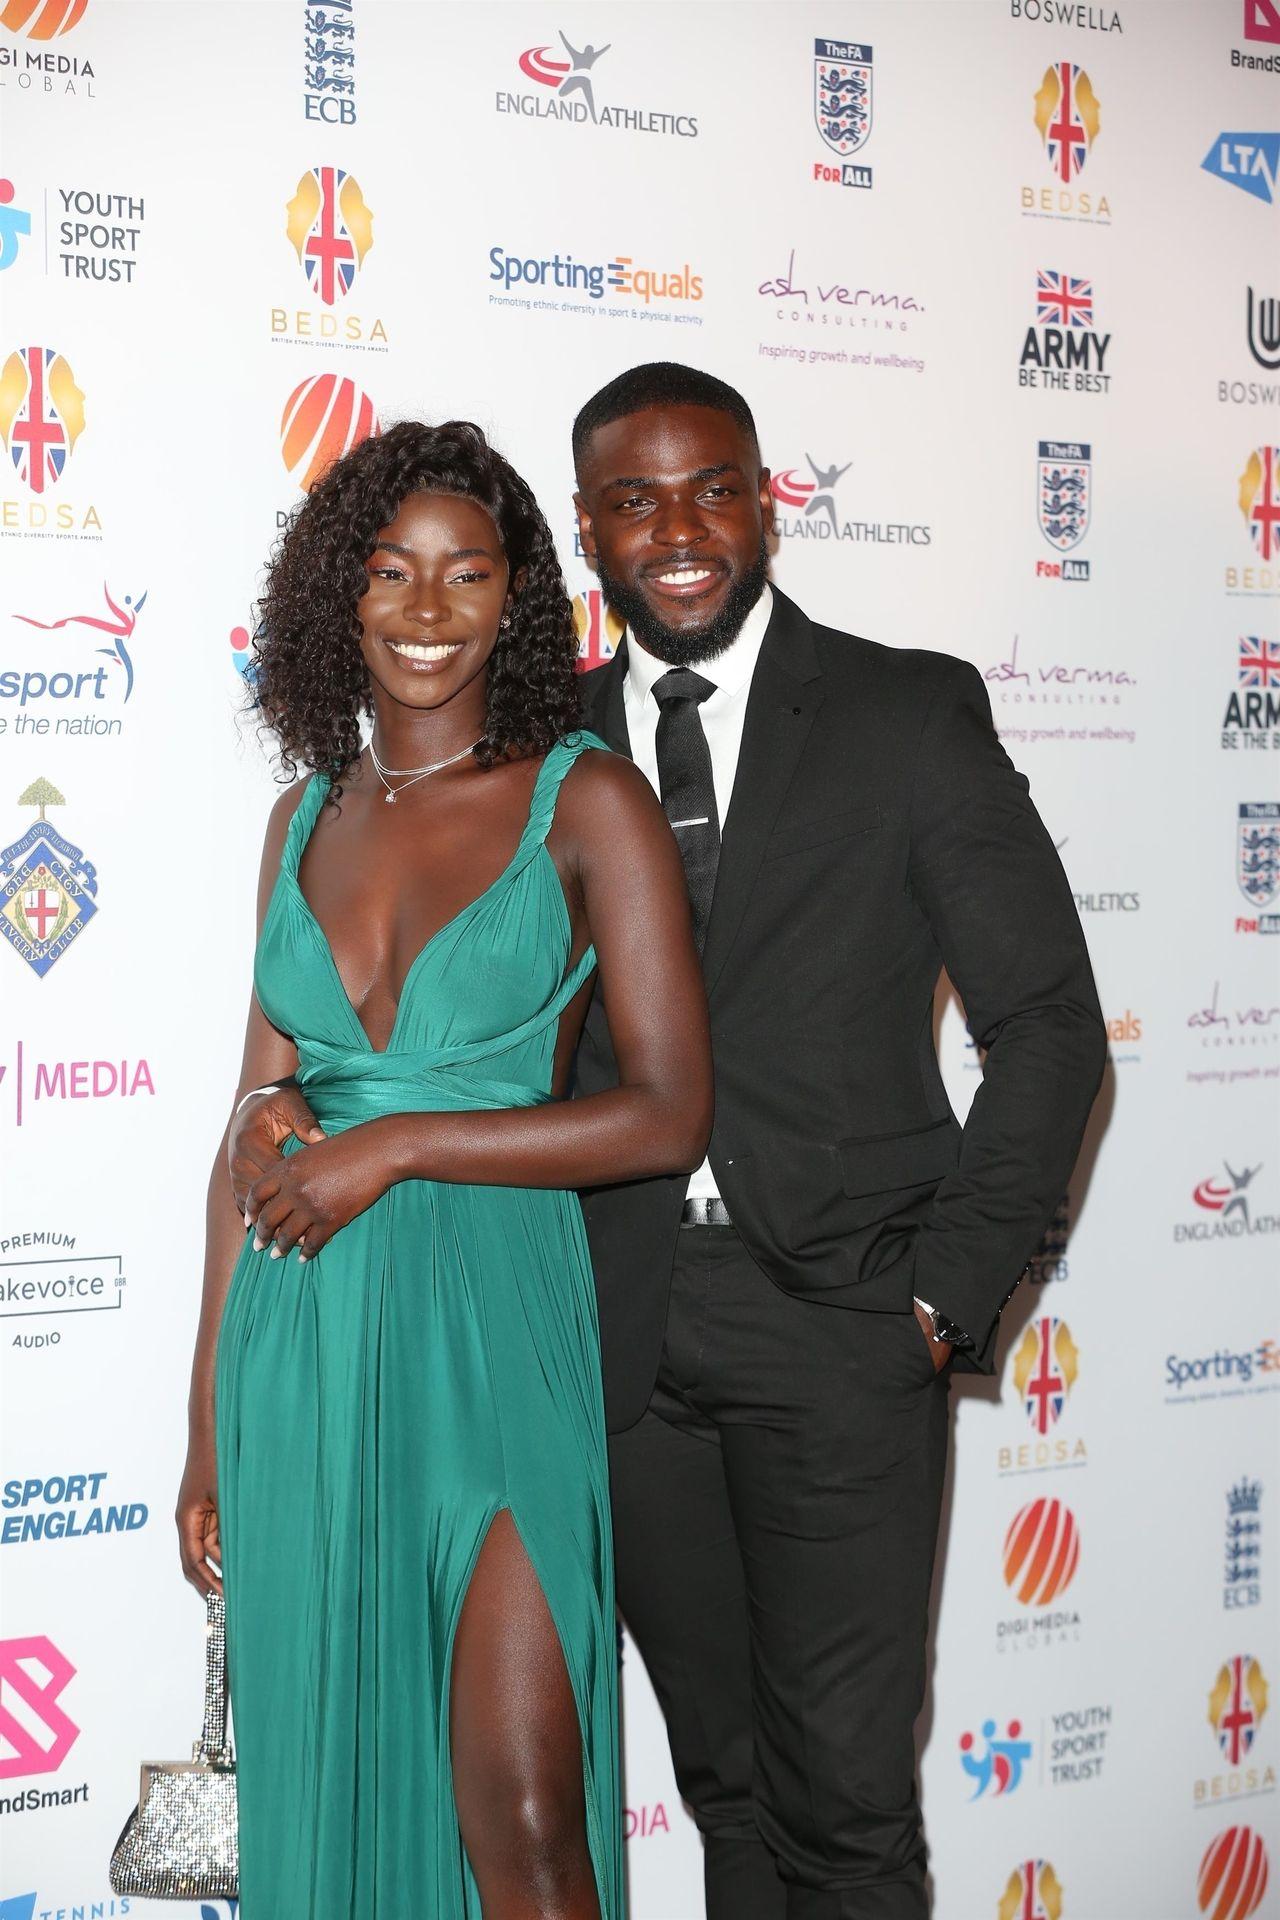 Mike Boateng & Priscilla Anyabu Are Seen At British Ethnic Diversity Sports Awards 0037